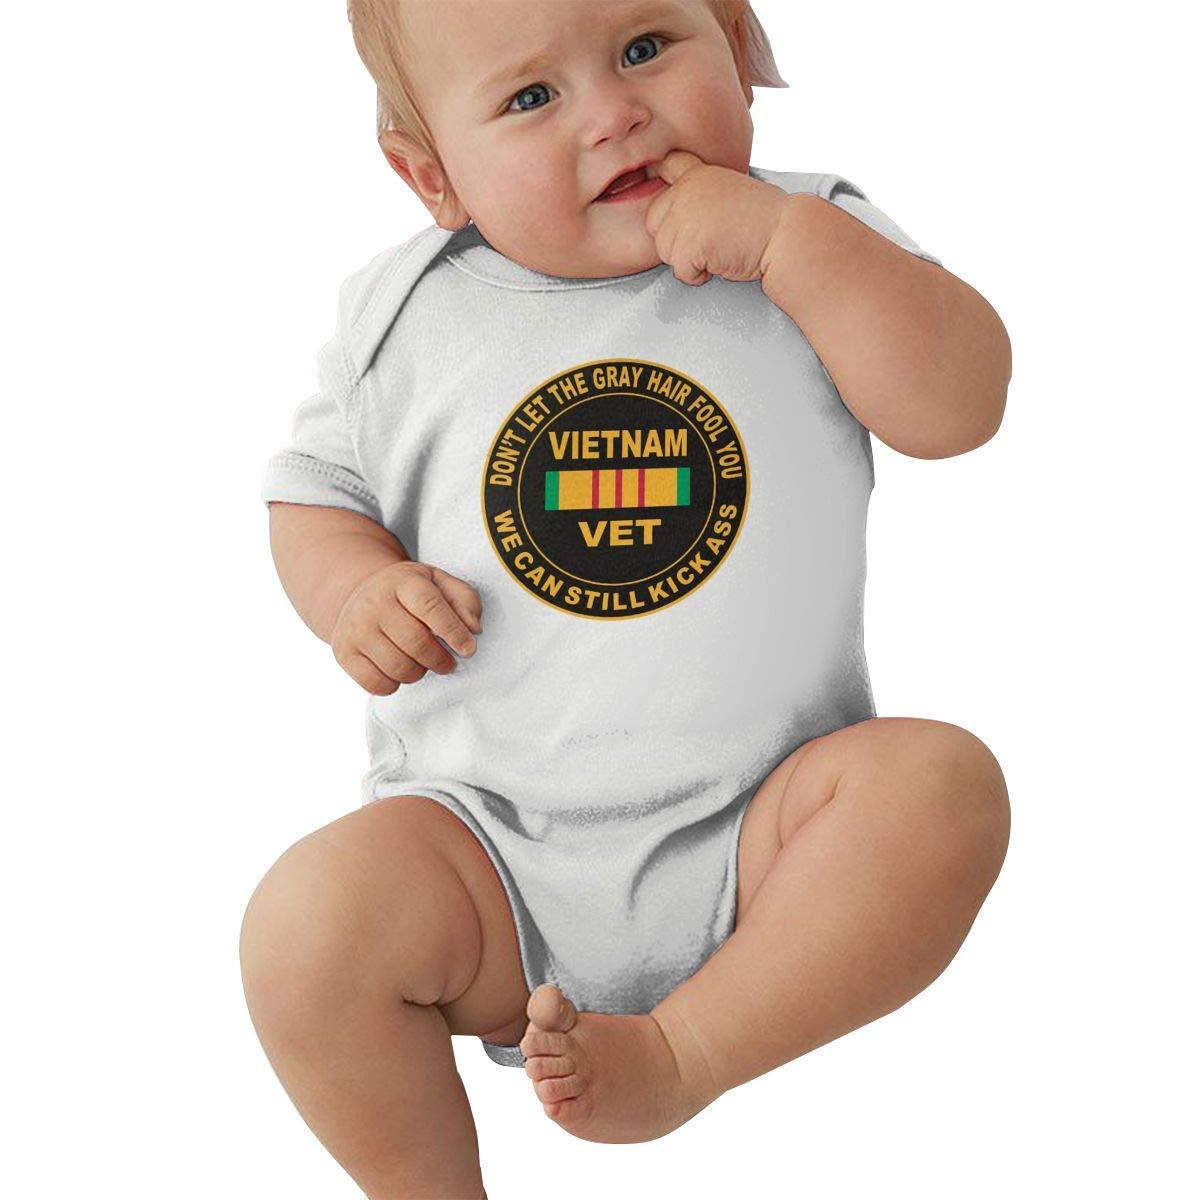 Dfenere Gray Let The Gray Hair Fool You Hip Hop Newborn Baby Short Sleeve Bodysuit Romper Infant Summer Clothing Black